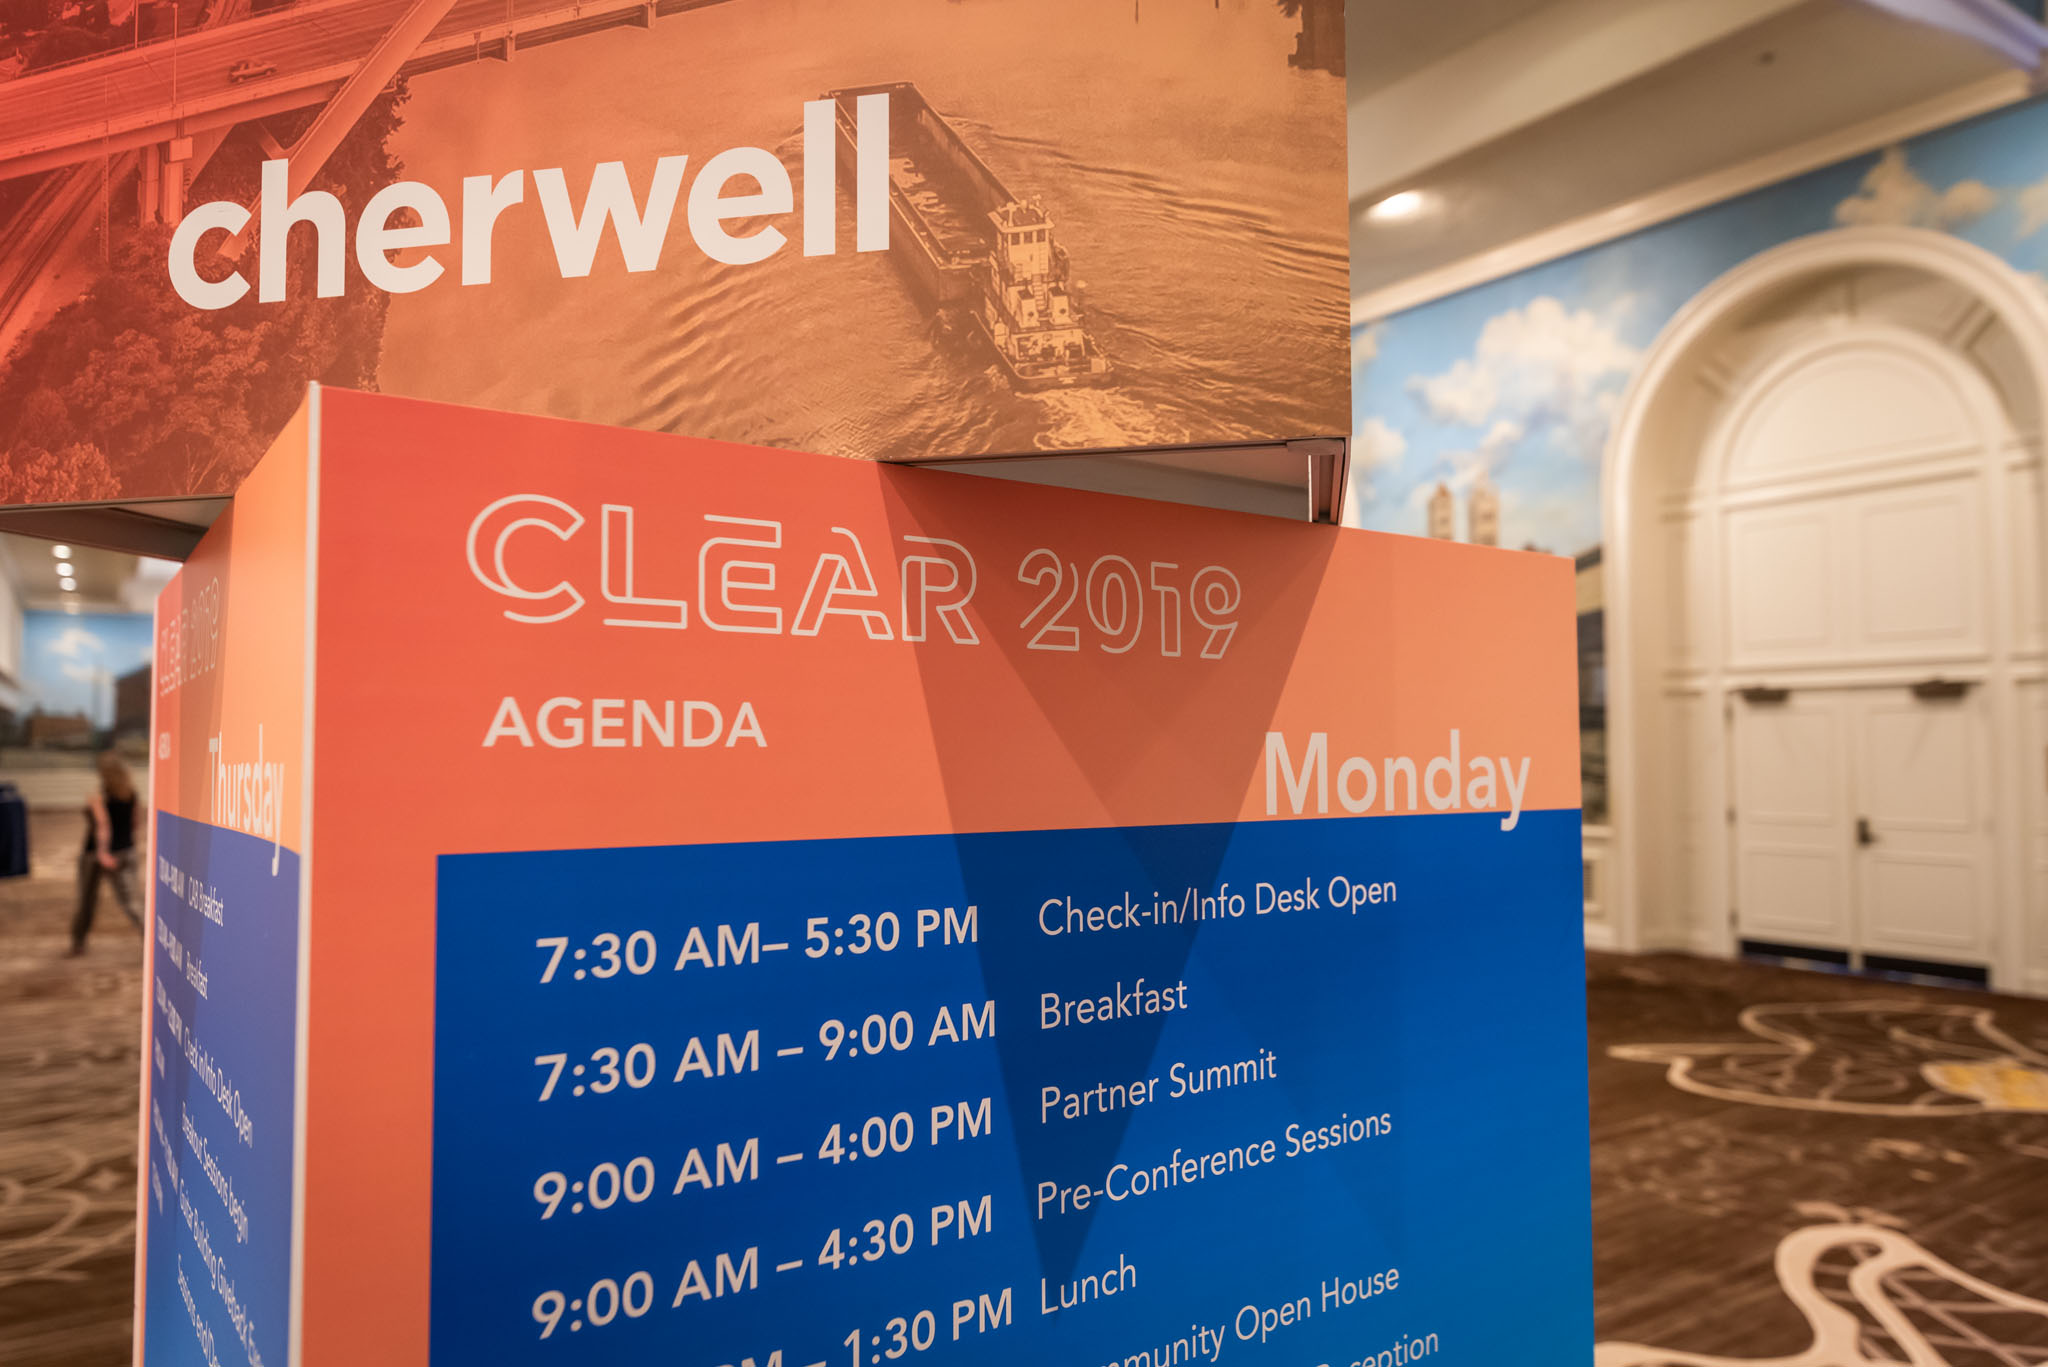 Cherwell_Clear_2019_029.jpg